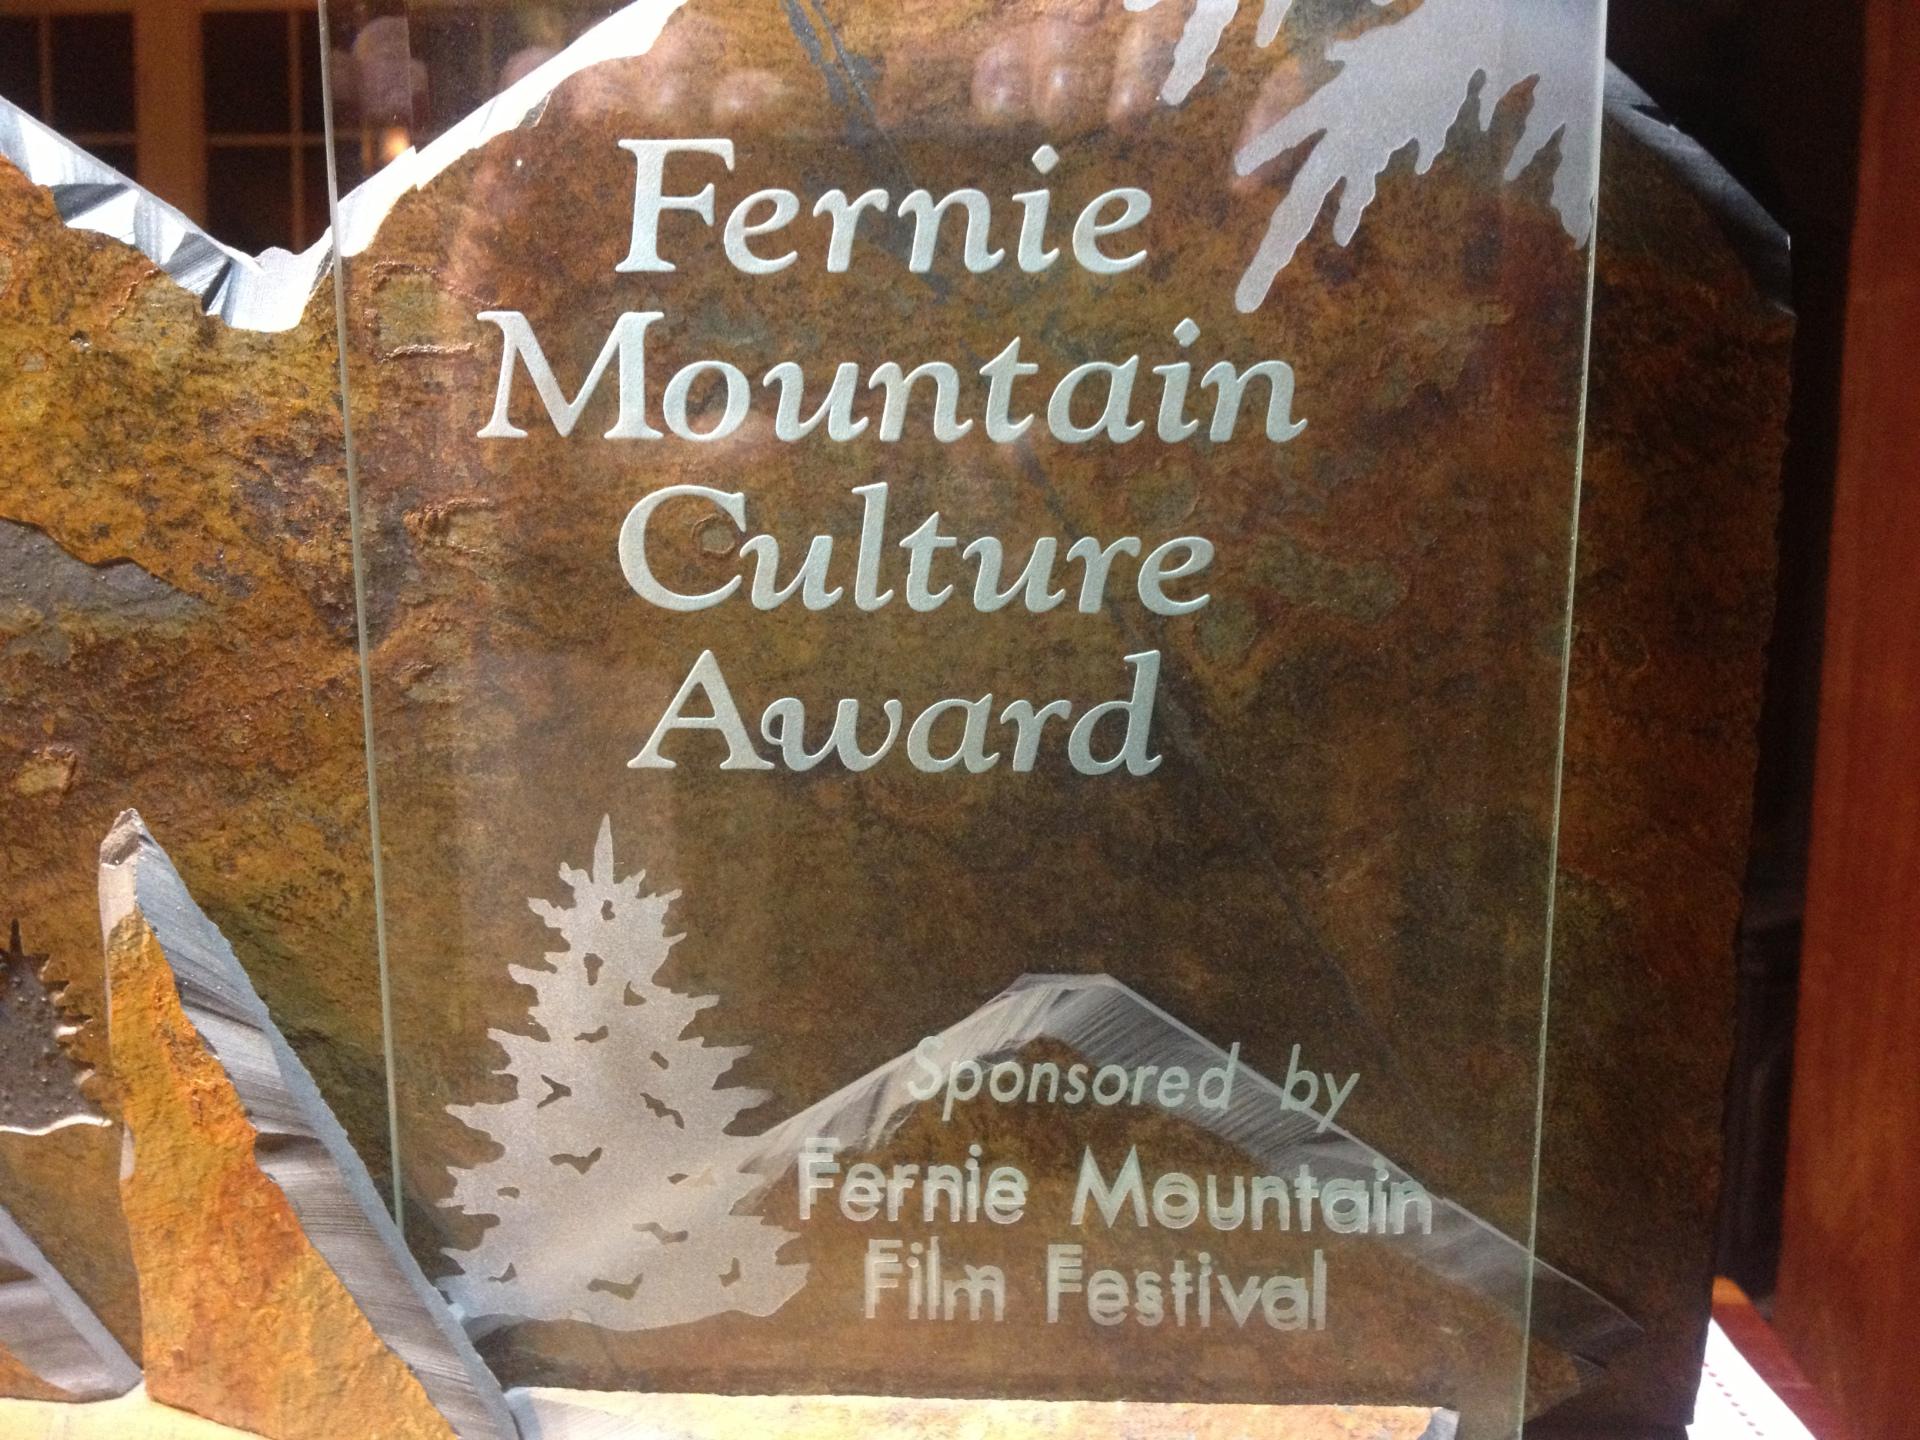 Fernie Mountain Culture Award